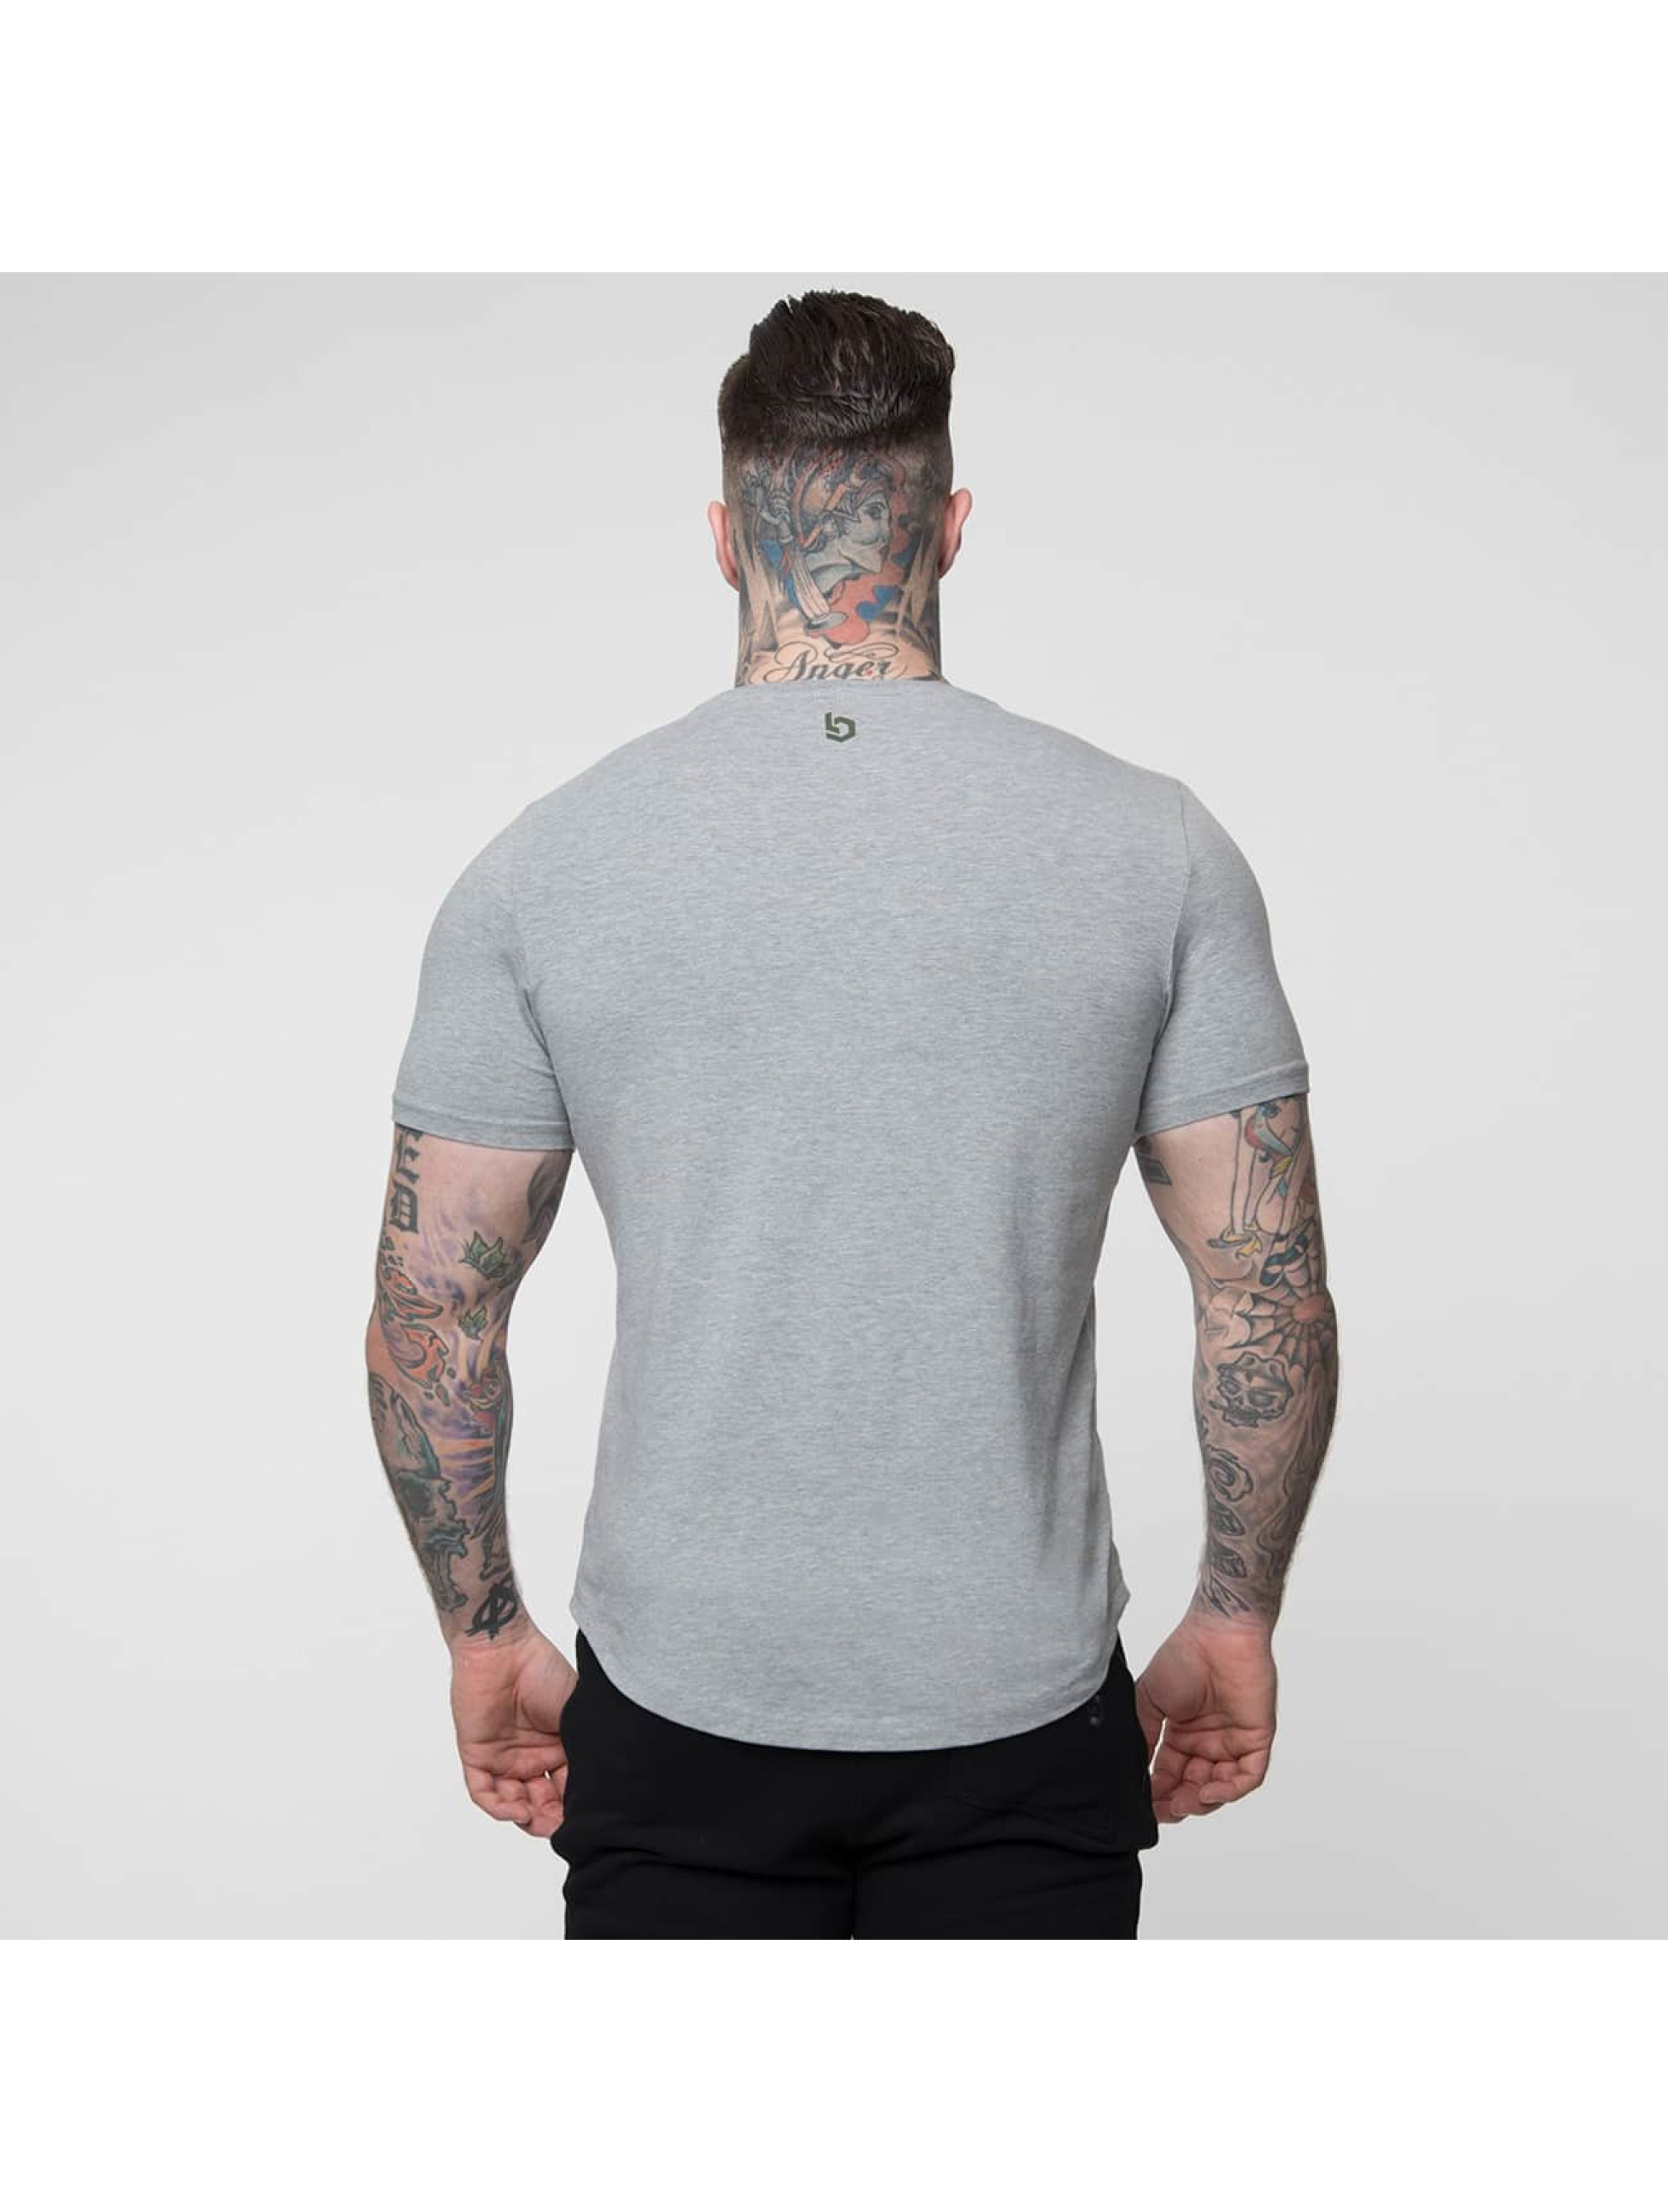 Beyond Limits Camiseta Signature gris